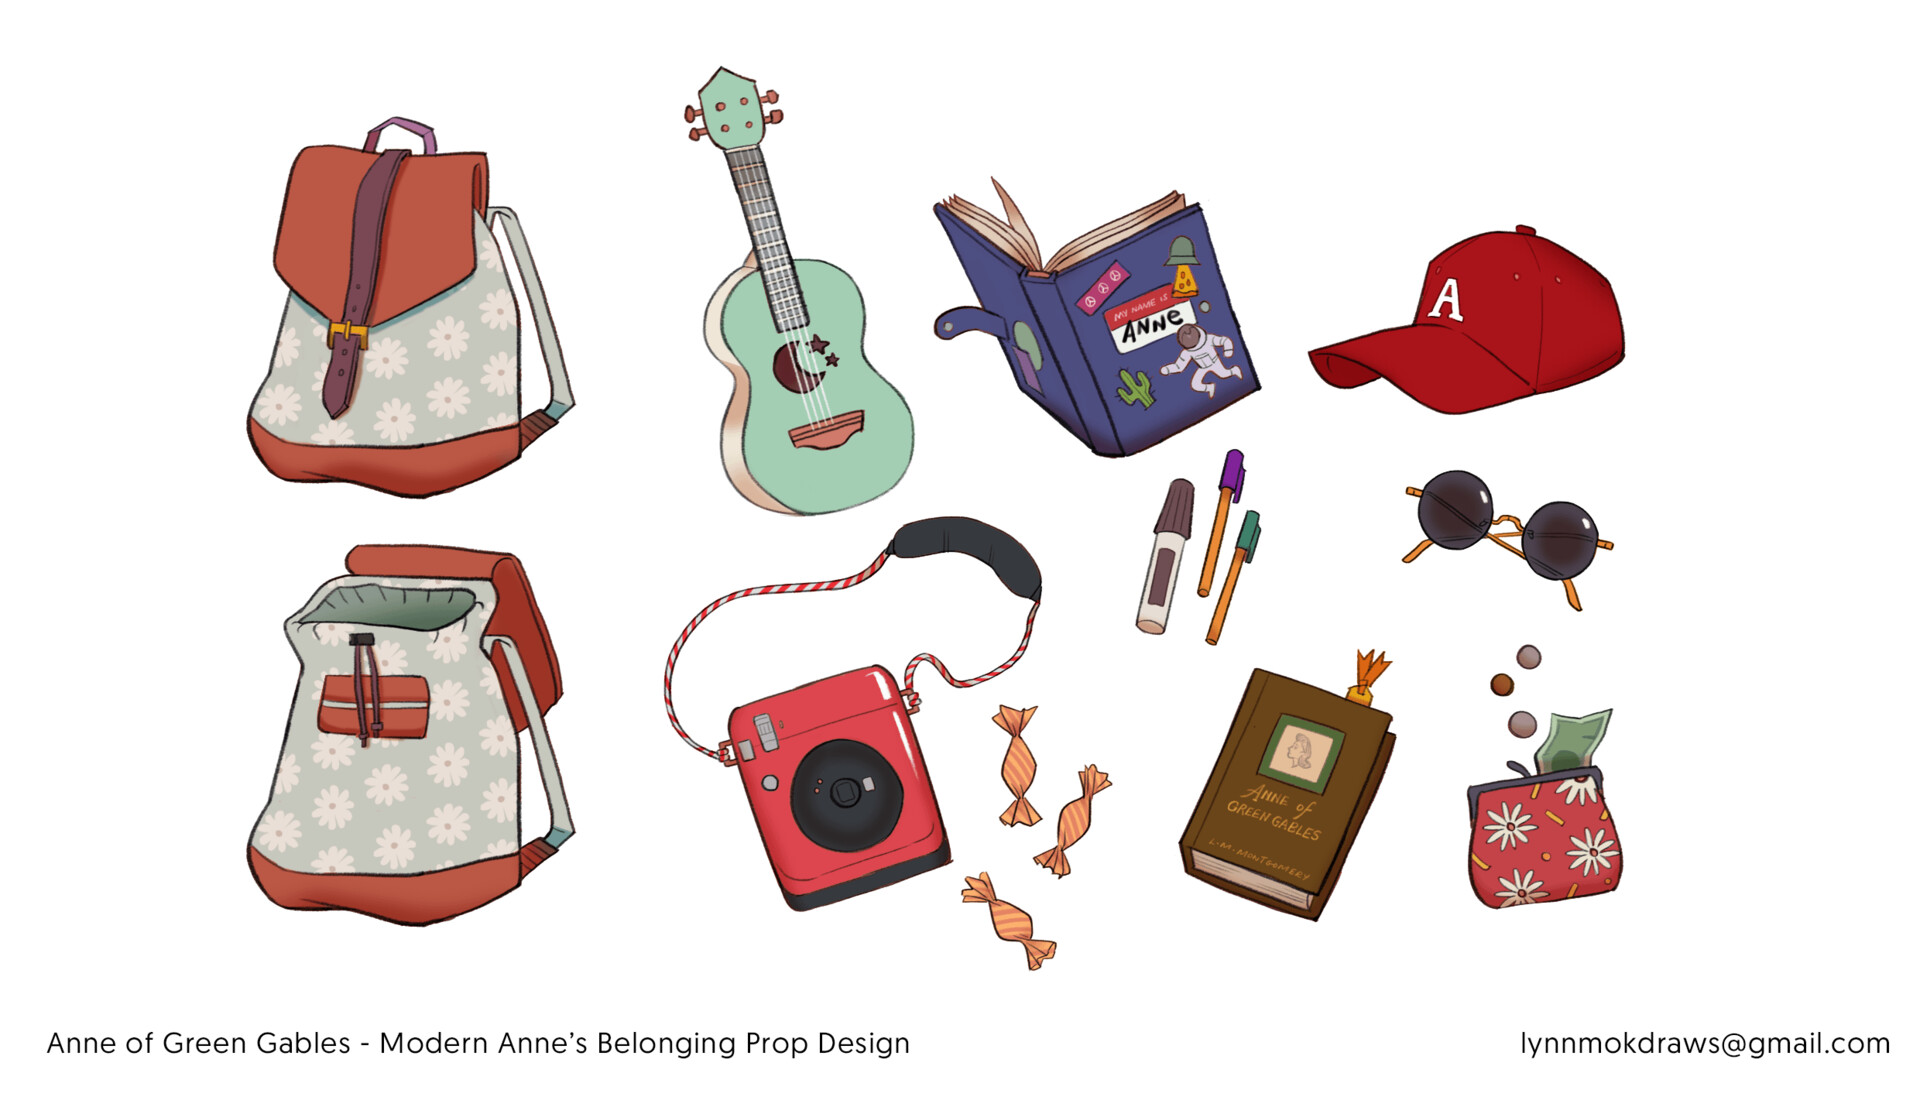 Modern Anne's belonging - prop design